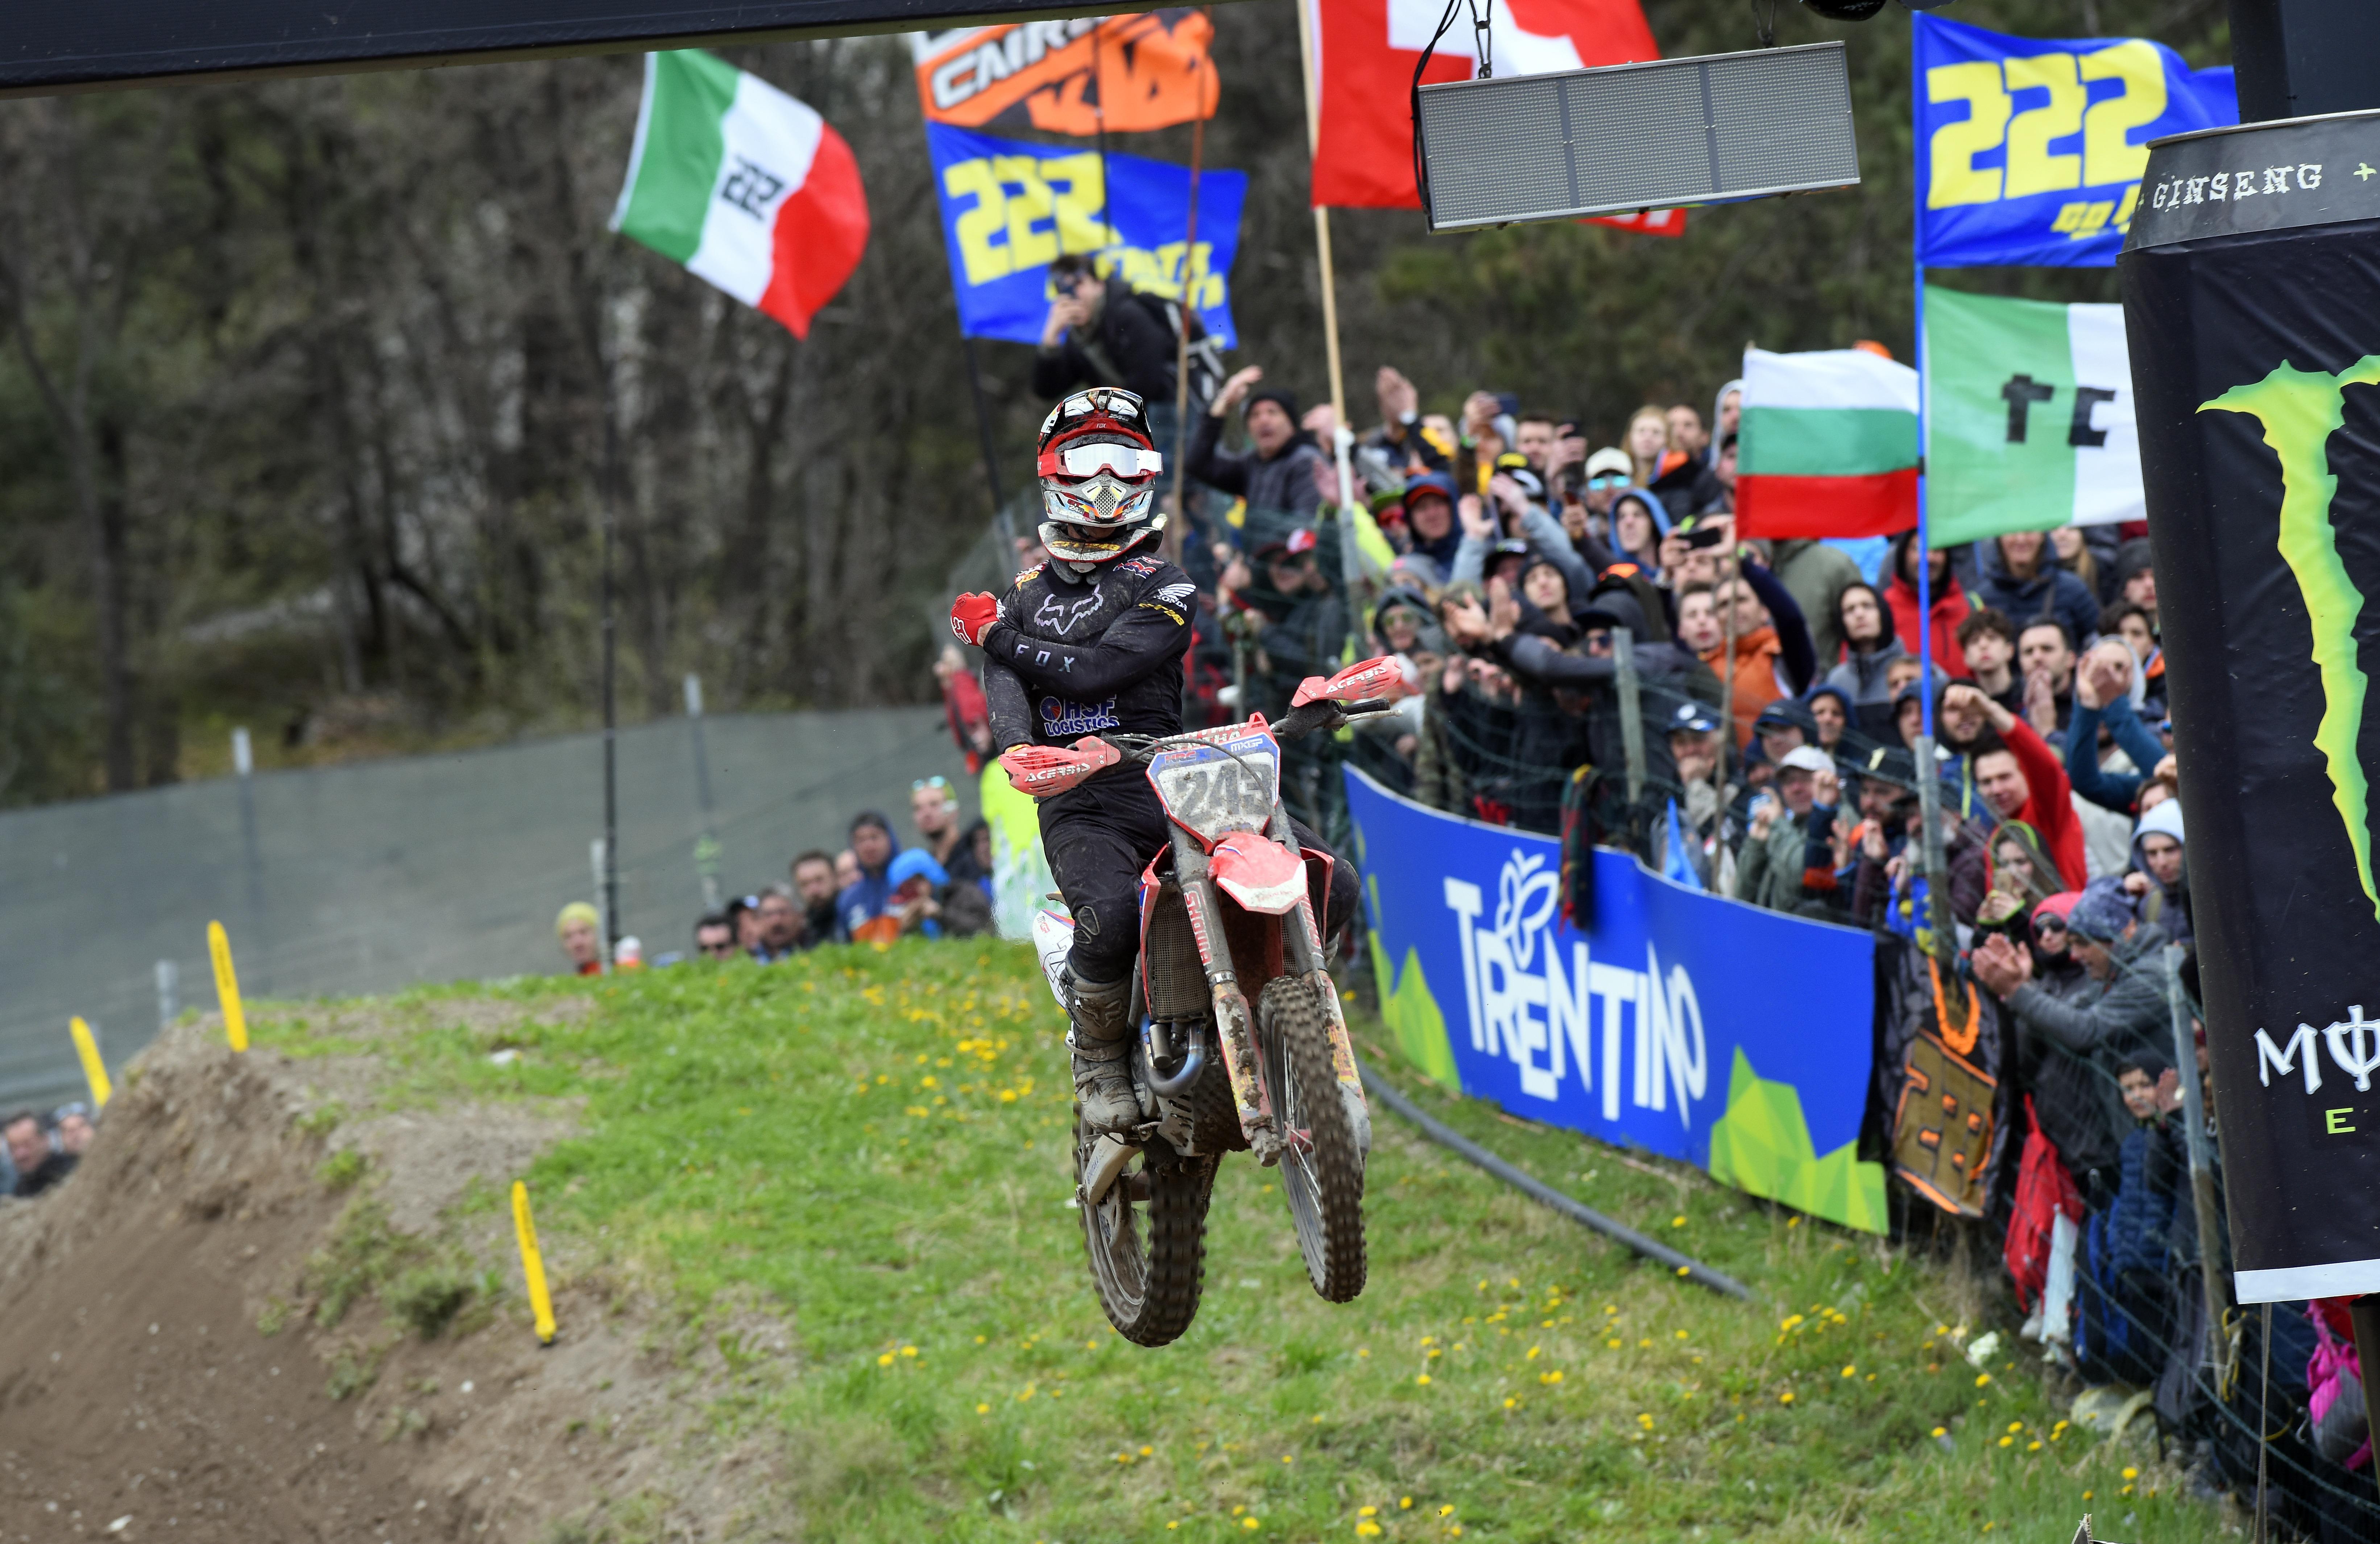 Tim Gajser - Pirelli - MXGP of Trentino